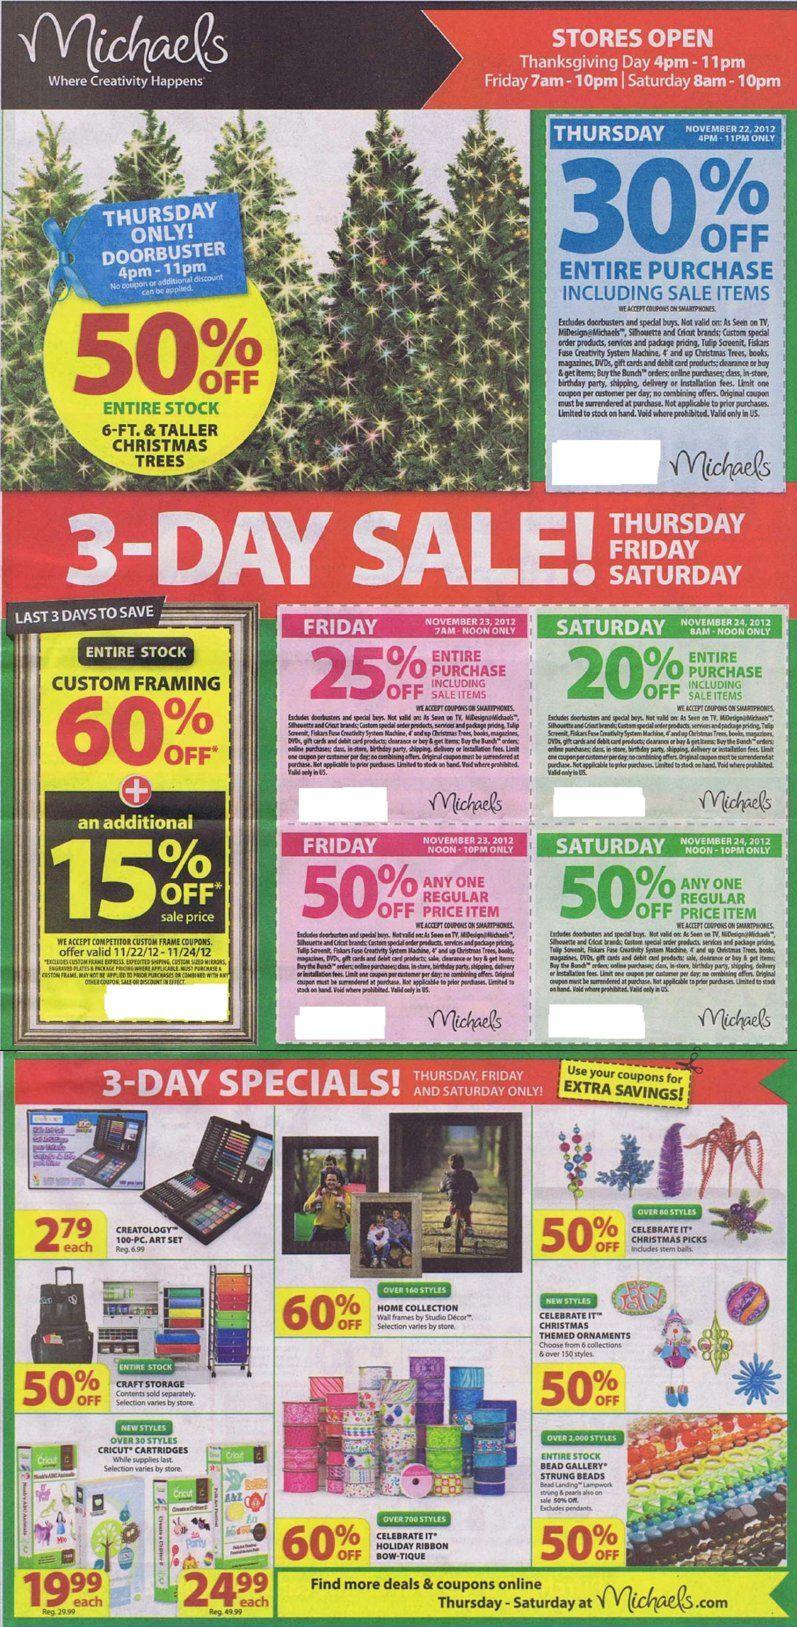 michaels black friday deals - Michaels After Christmas Sale